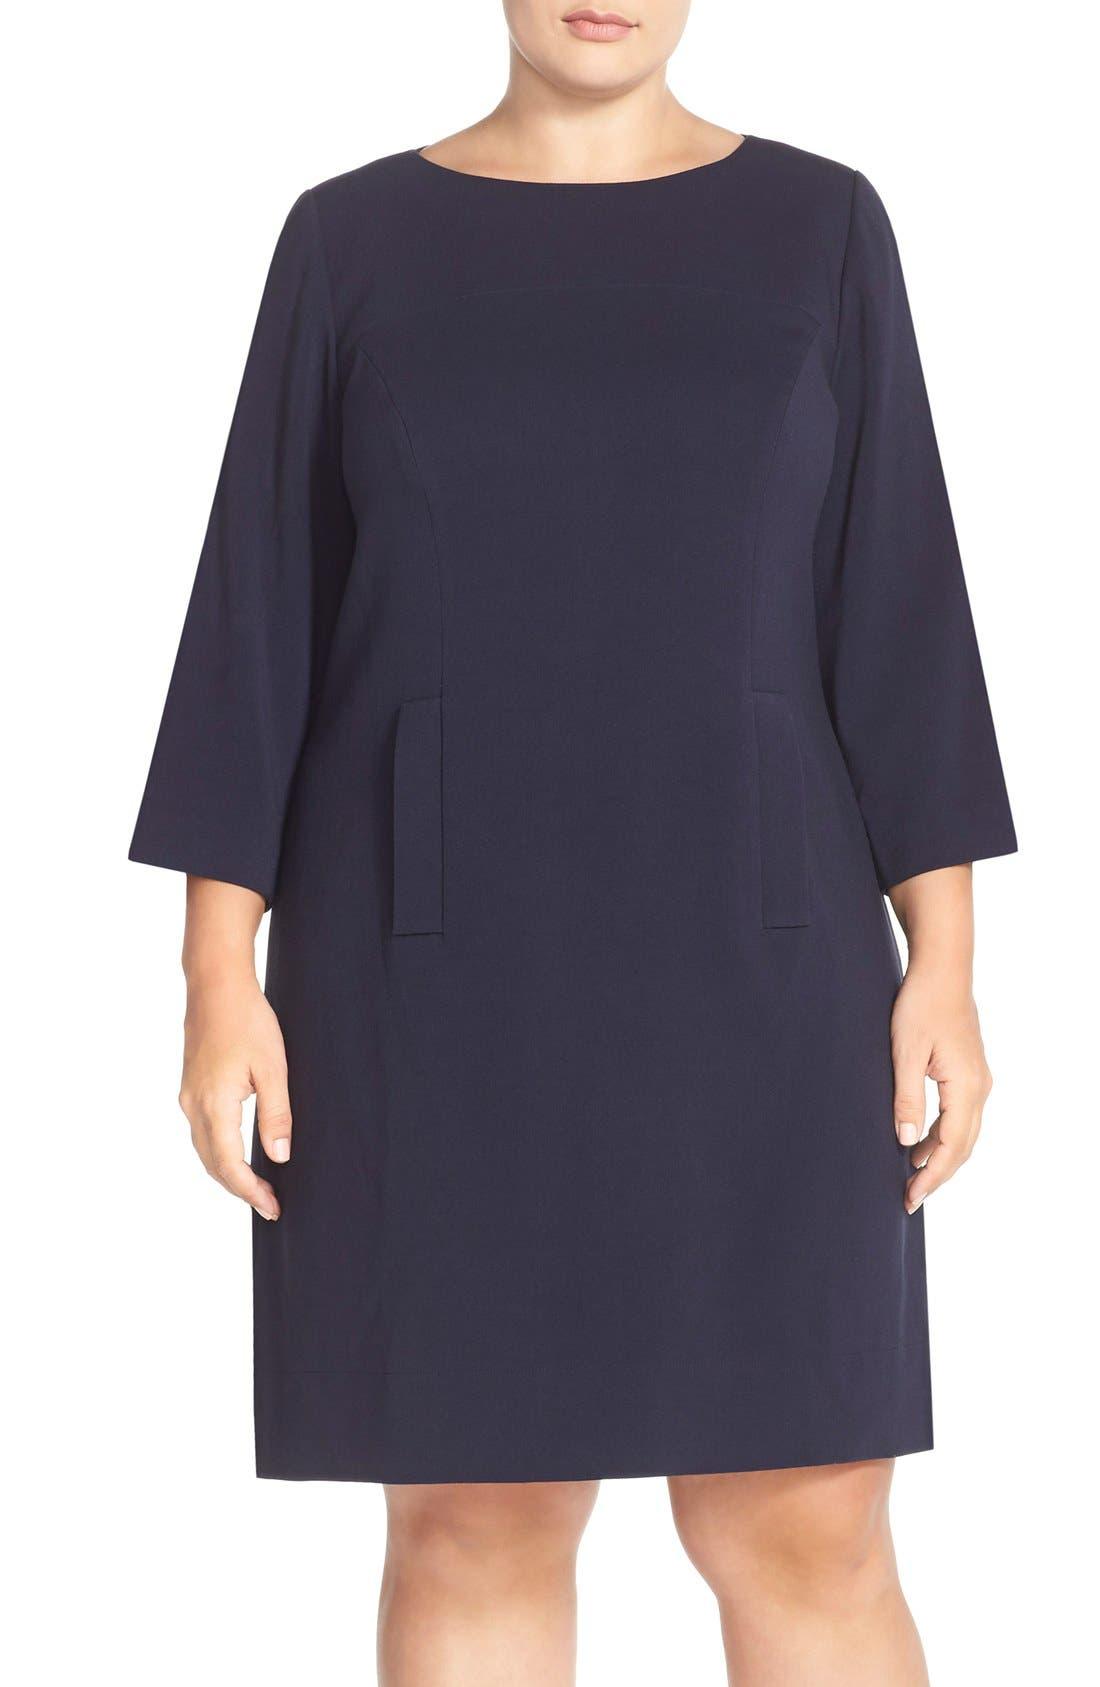 Alternate Image 1 Selected - Eliza J Pocket Detail Shift Dress (Plus Size)